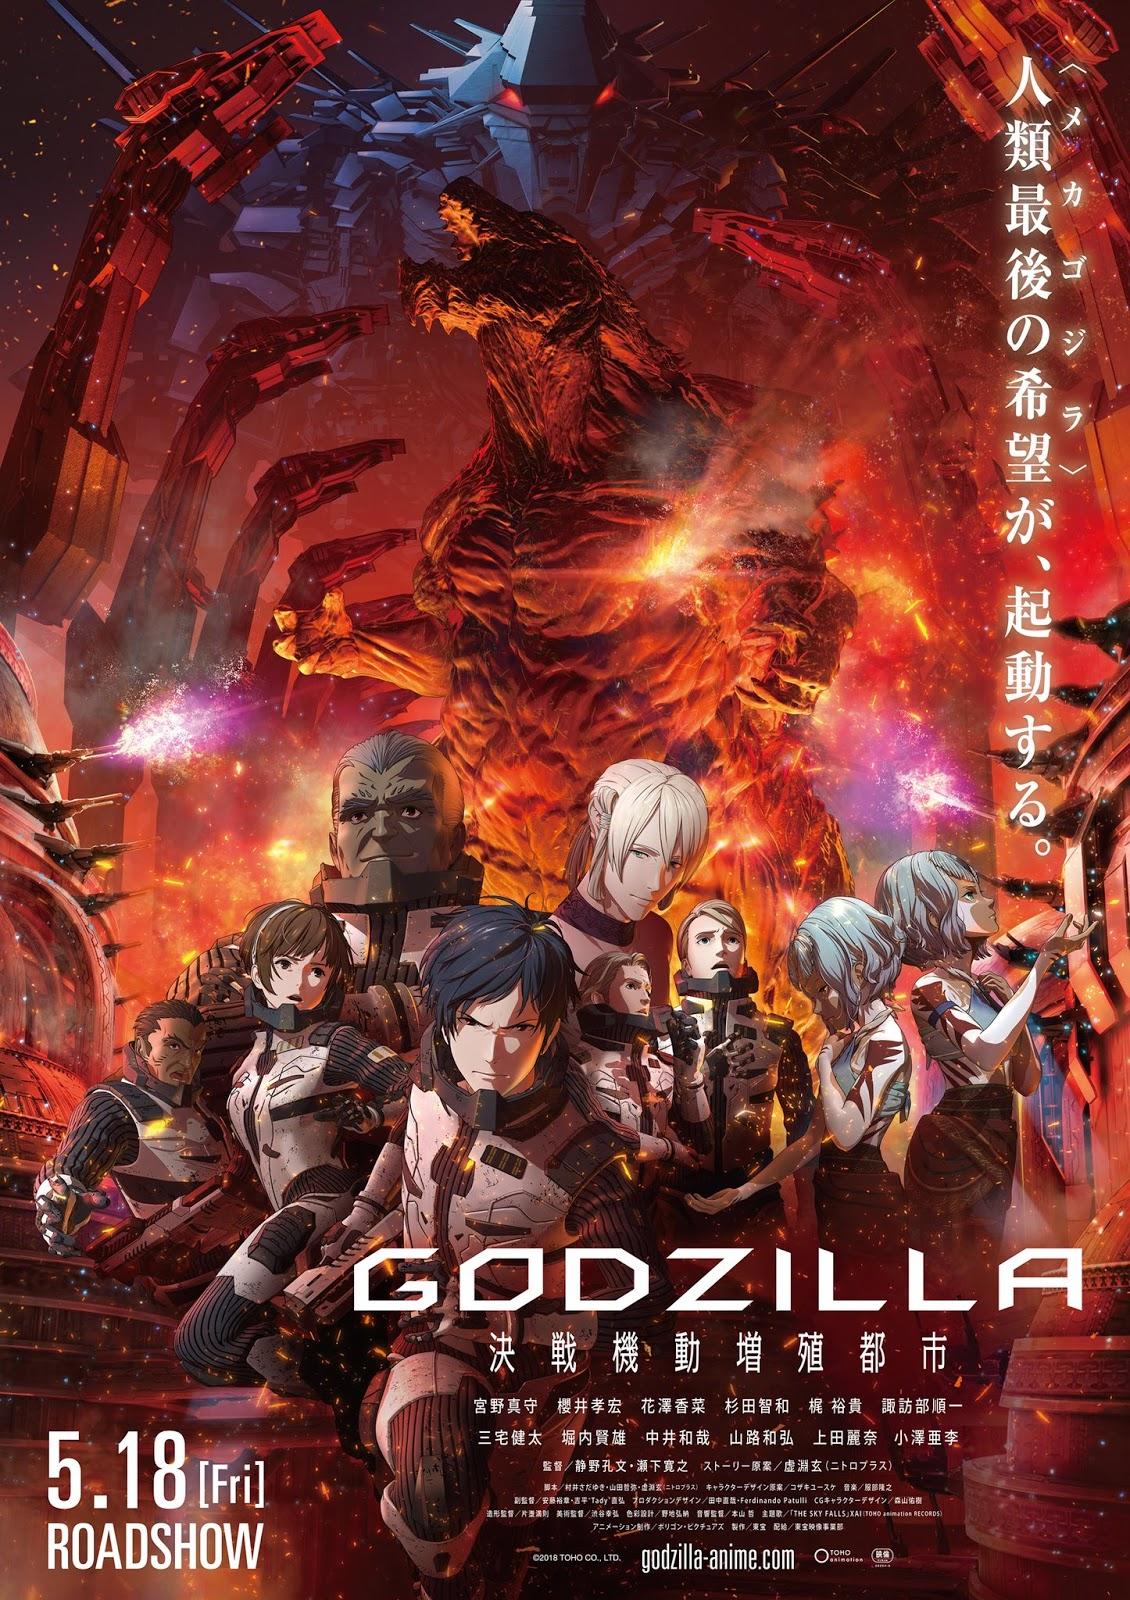 Godzilla City on the Edge of Battle (2018) ก็อดซิลล่า สงครามใกล้ปะทุ